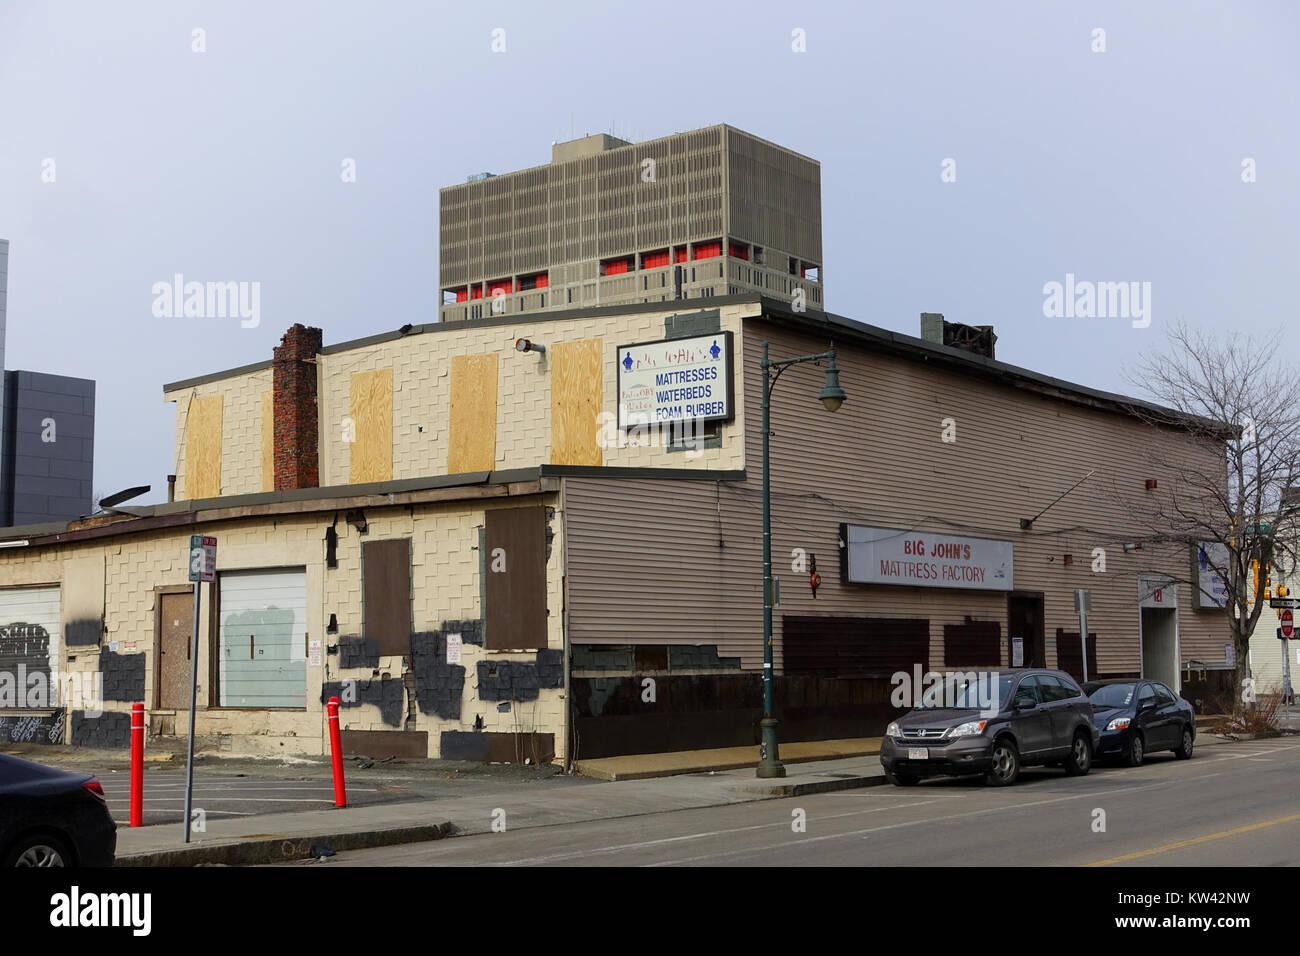 Big John's Mattress Factory Cambridge, MA DSC05690 Immagini Stock